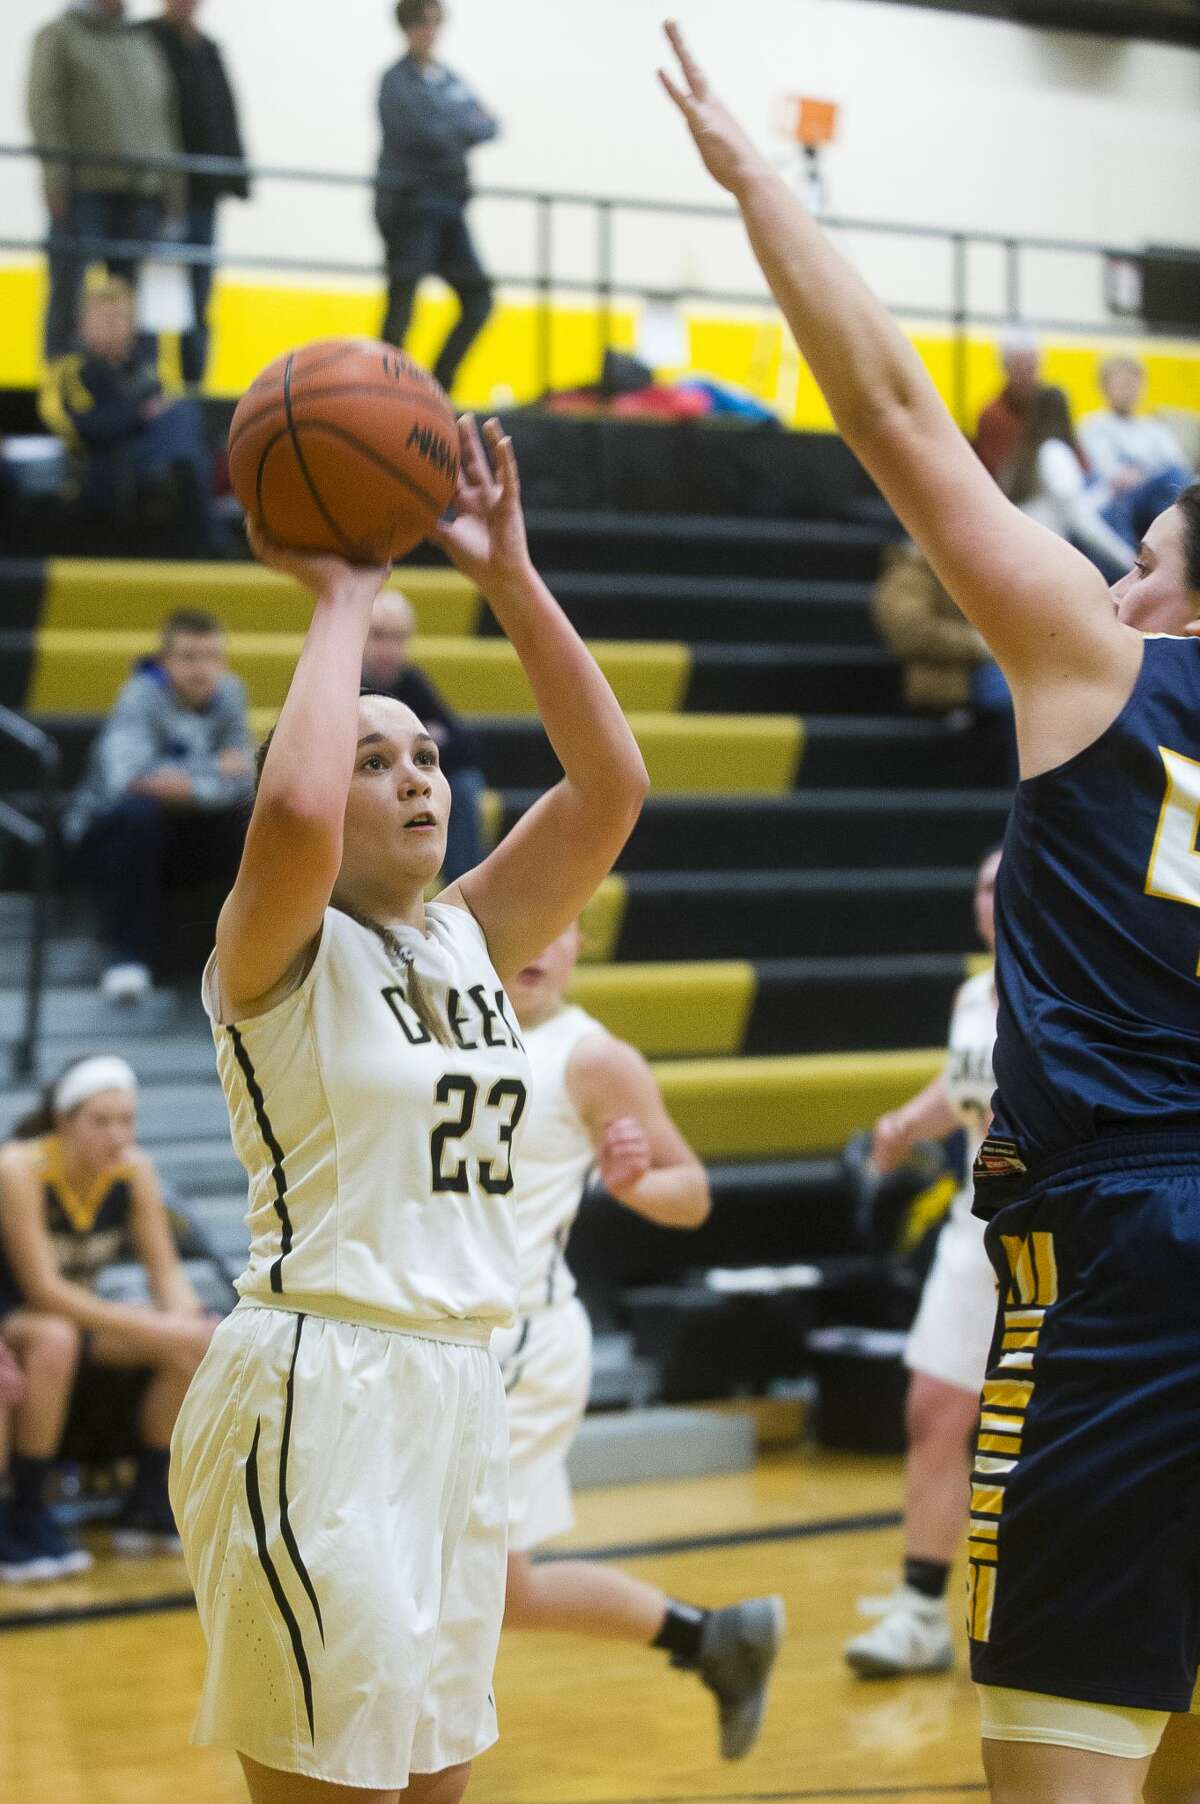 Bullock Creek freshman Erika Cianek takes a shot during their game against Standish-Sterling on Friday, Dec. 15, 2017 at Bullock Creek High School. (Katy Kildee/kkildee@mdn.net)